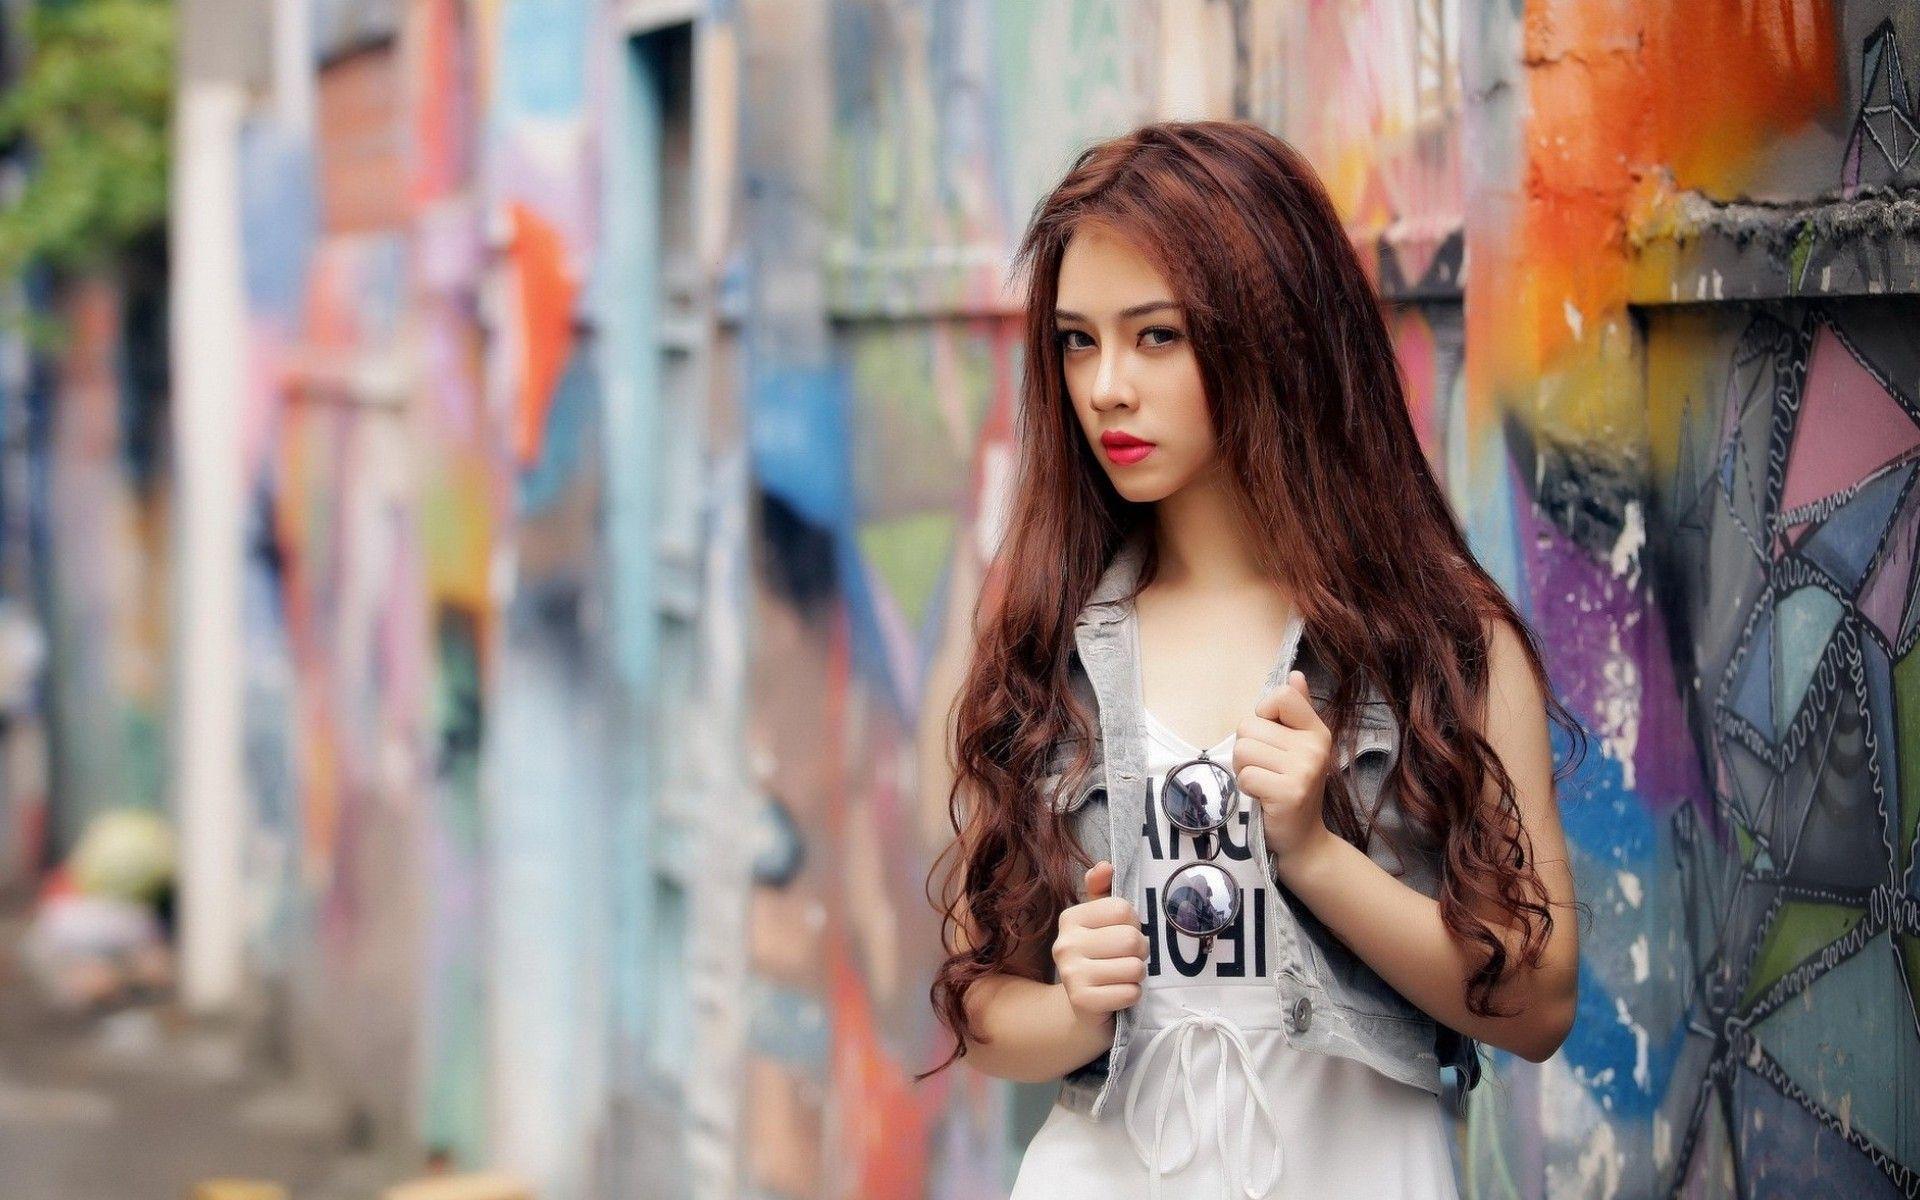 Fashion Girl Wallpapers Top Free Fashion Girl Backgrounds Wallpaperaccess